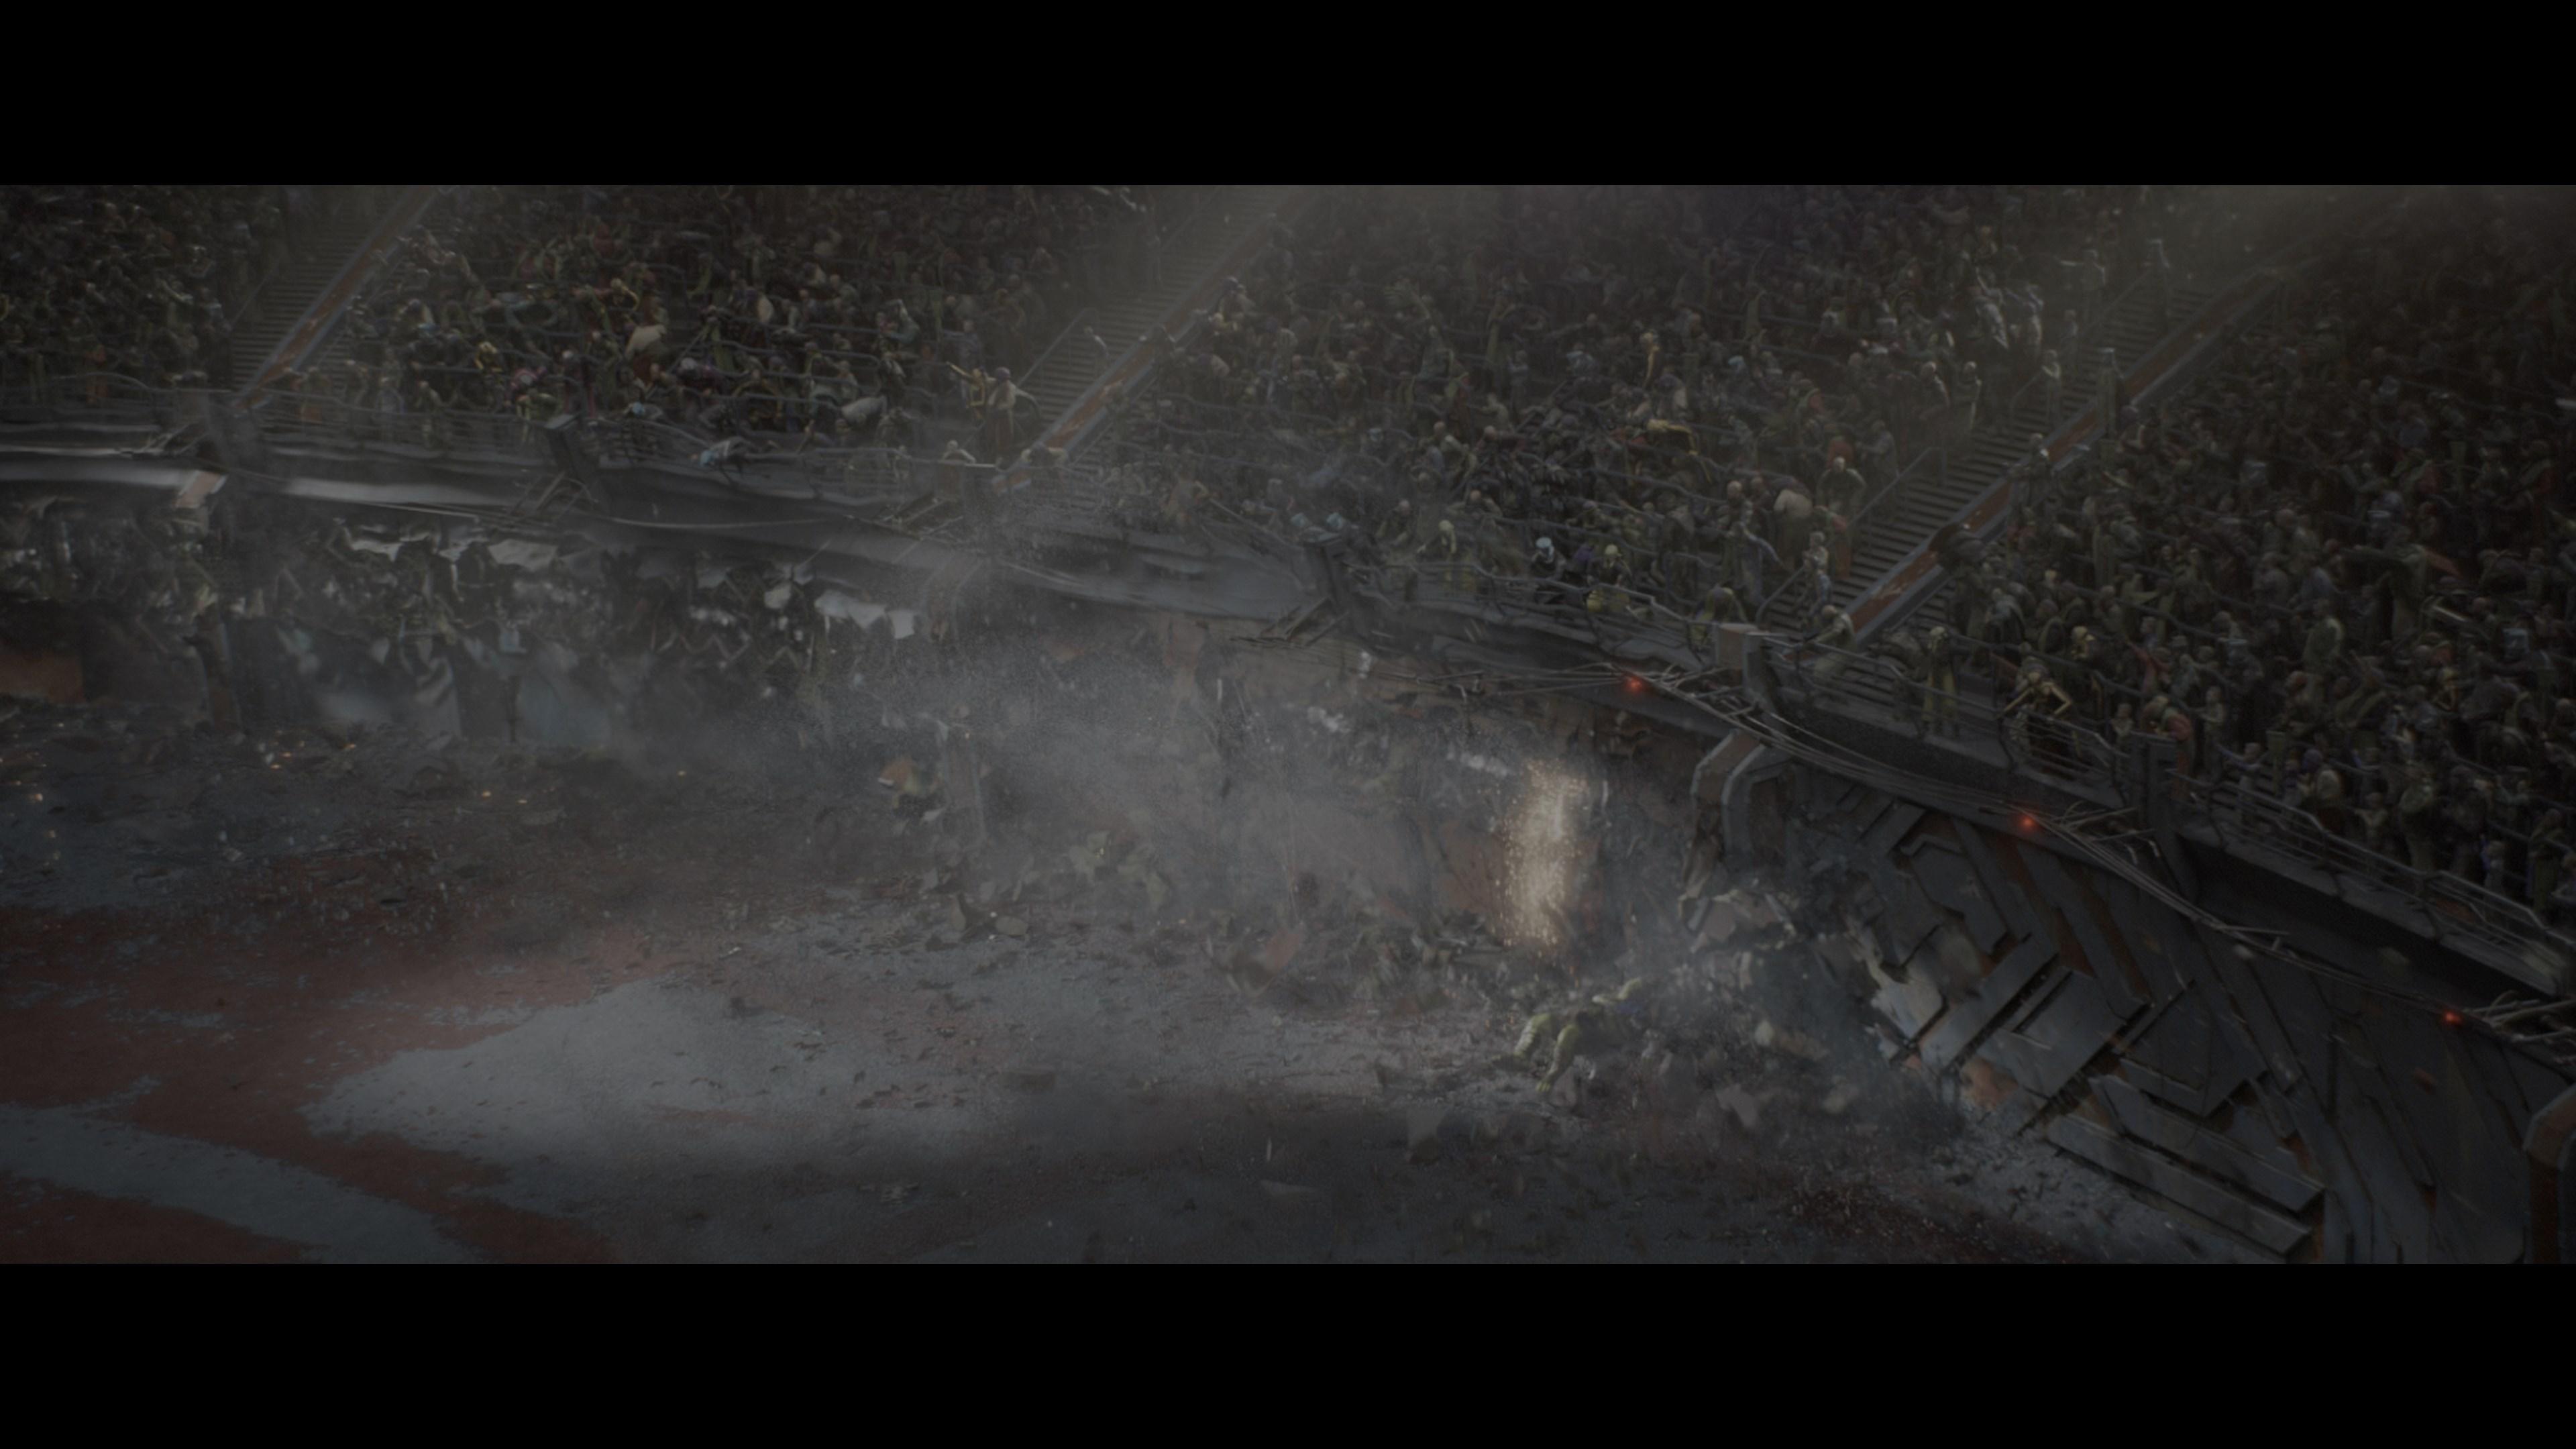 Thor: Ragnarok - 2017 - 2160p - 4K UltraHD - HDR - BluRay - x265 - Türkçe Dublaj - DuaL - TR - EN - Tek Link